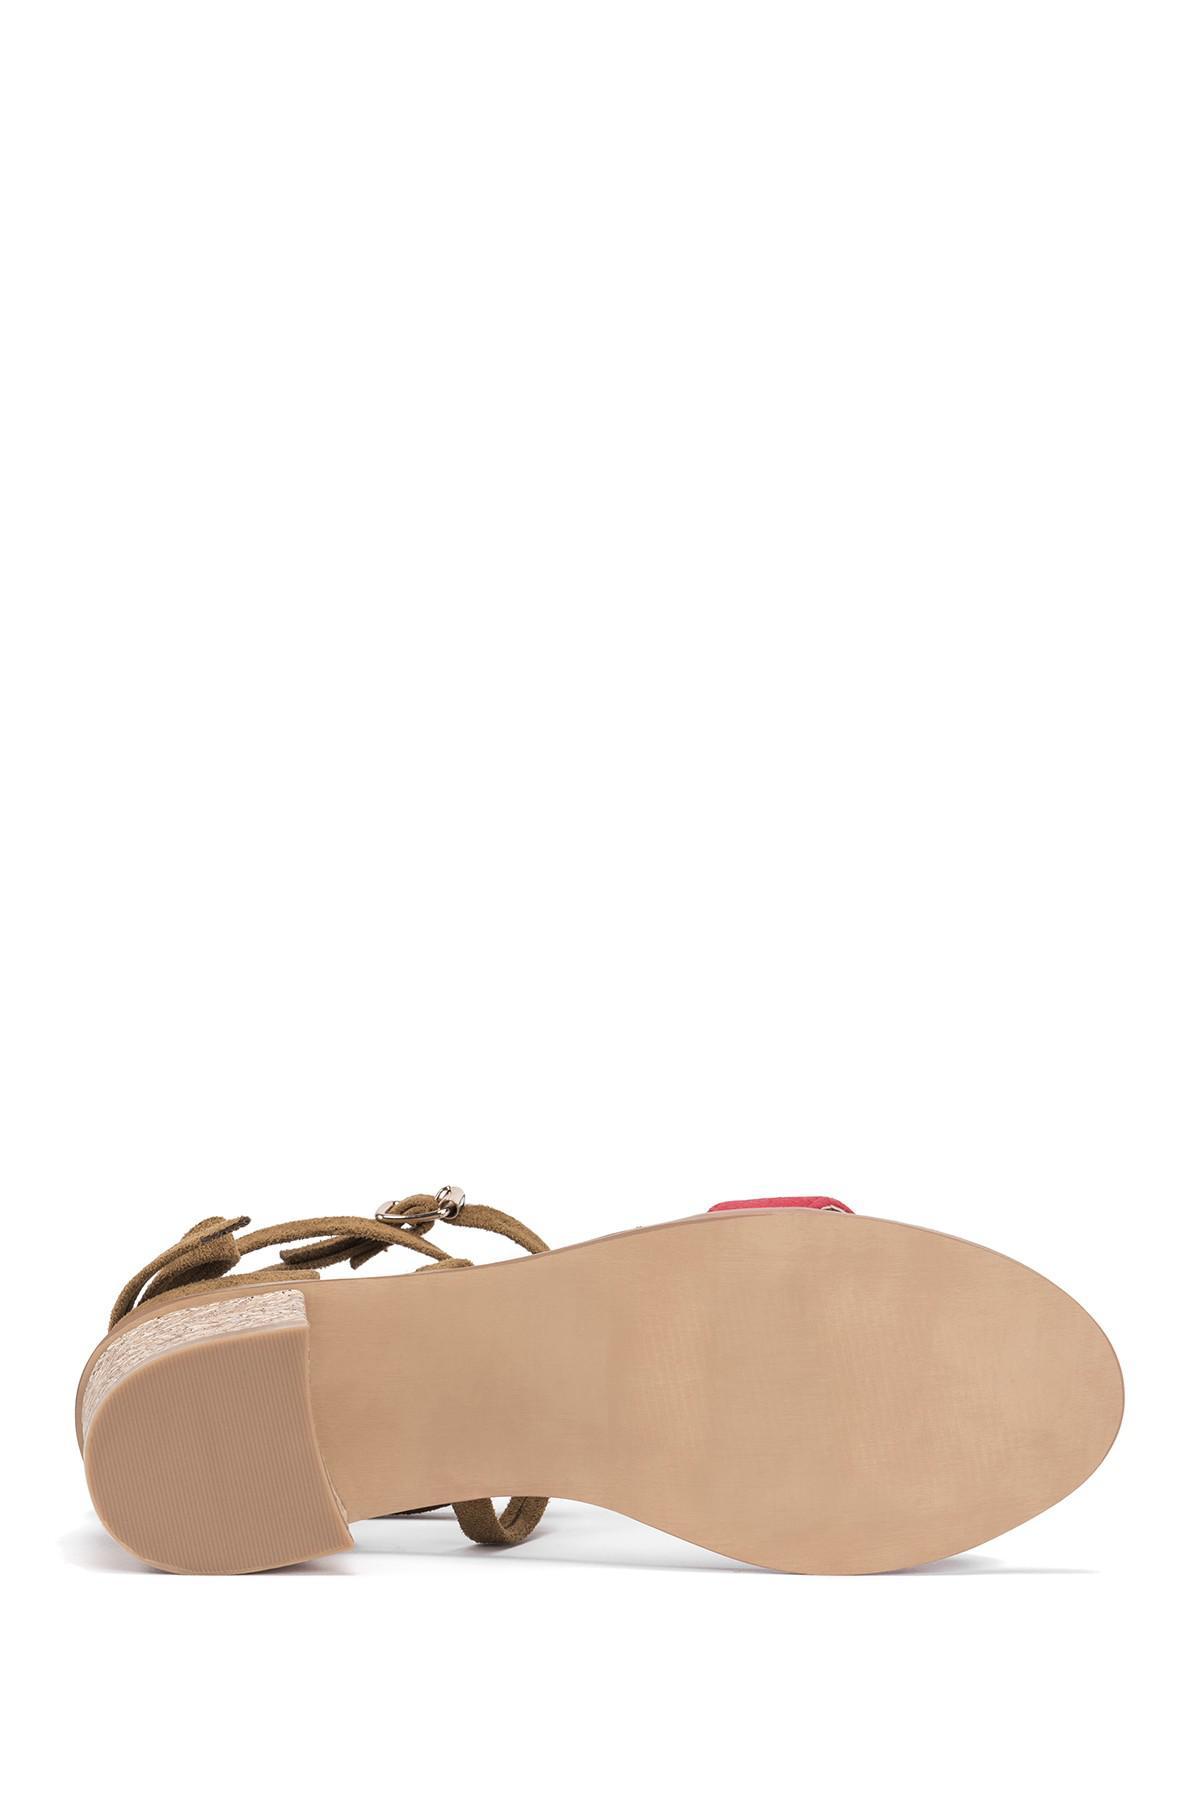 37154a26224f Lyst - Muk Luks Sasha Heeled Sandal